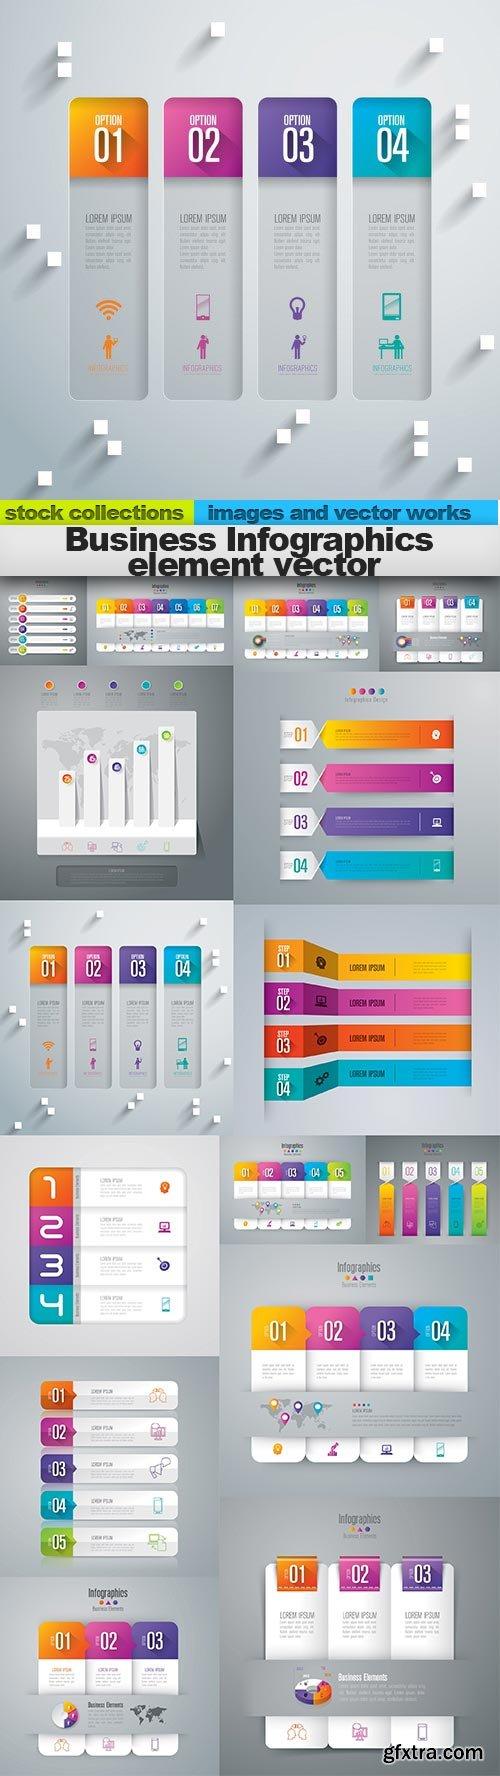 Business Infographics element vector, 15 x EPS